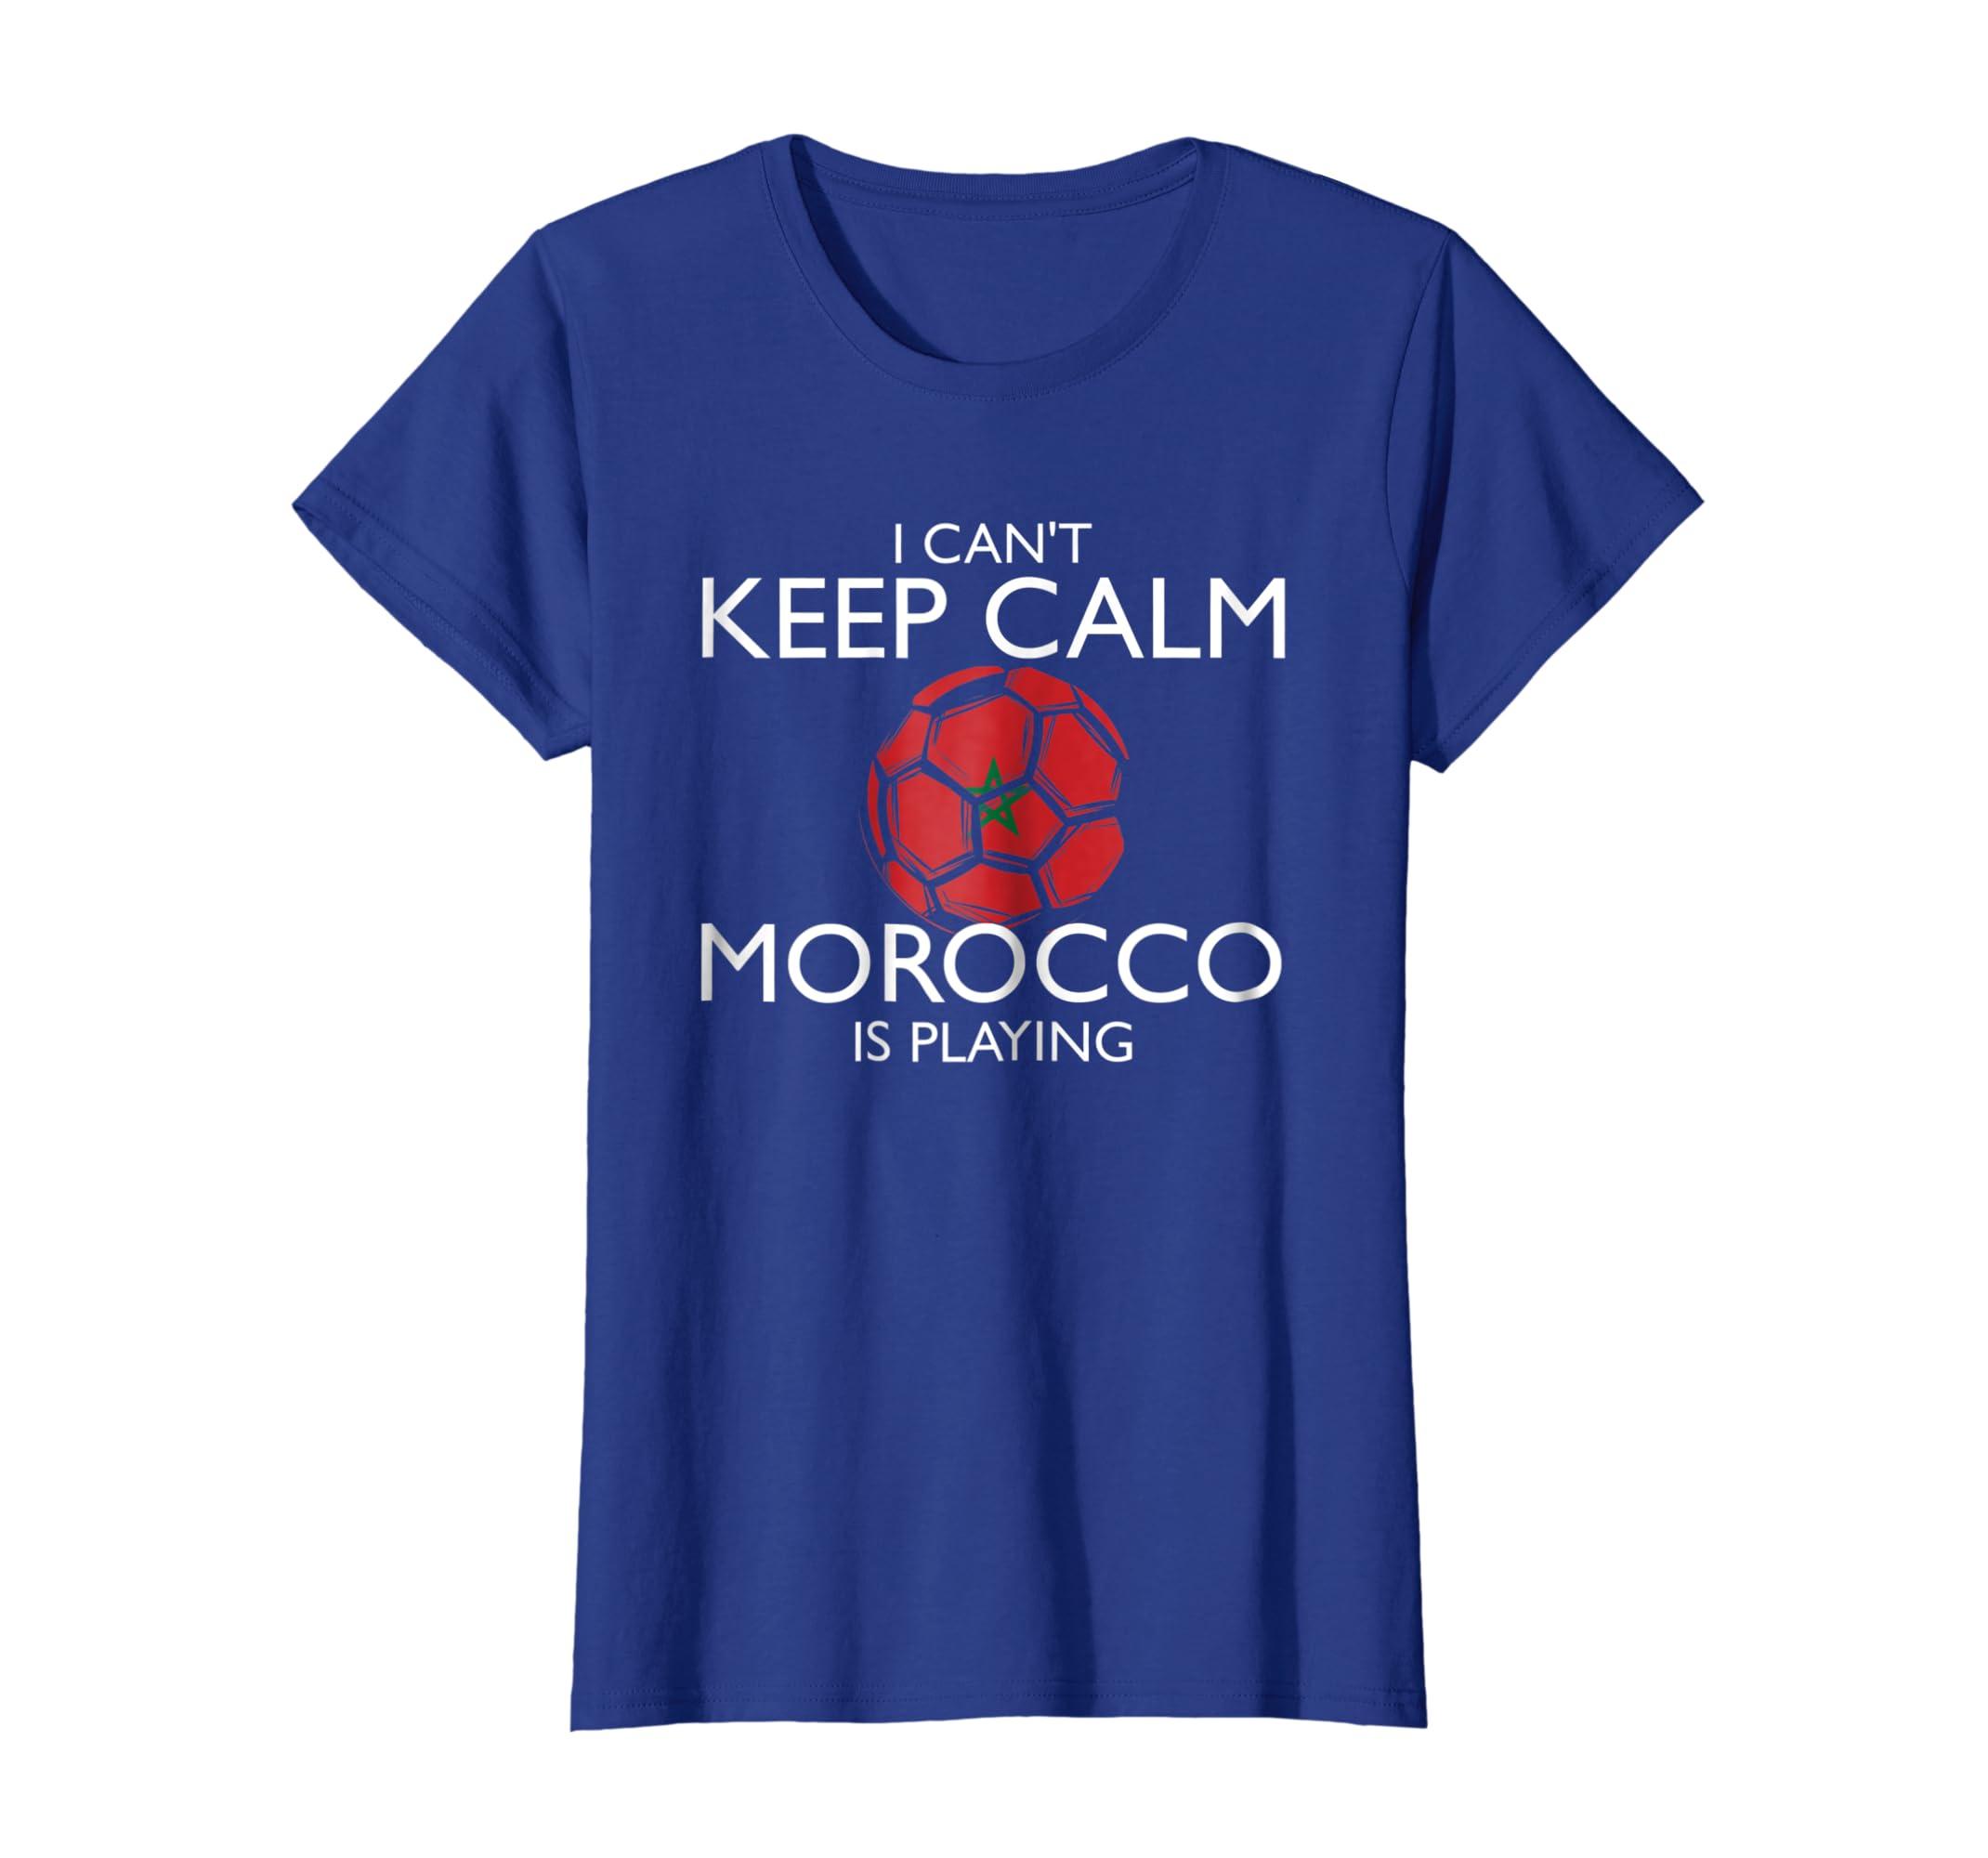 f5734d3b6c5 Amazon.com: Morocco Football Jersey 2018 Moroccan Soccer T-Shirt: Clothing